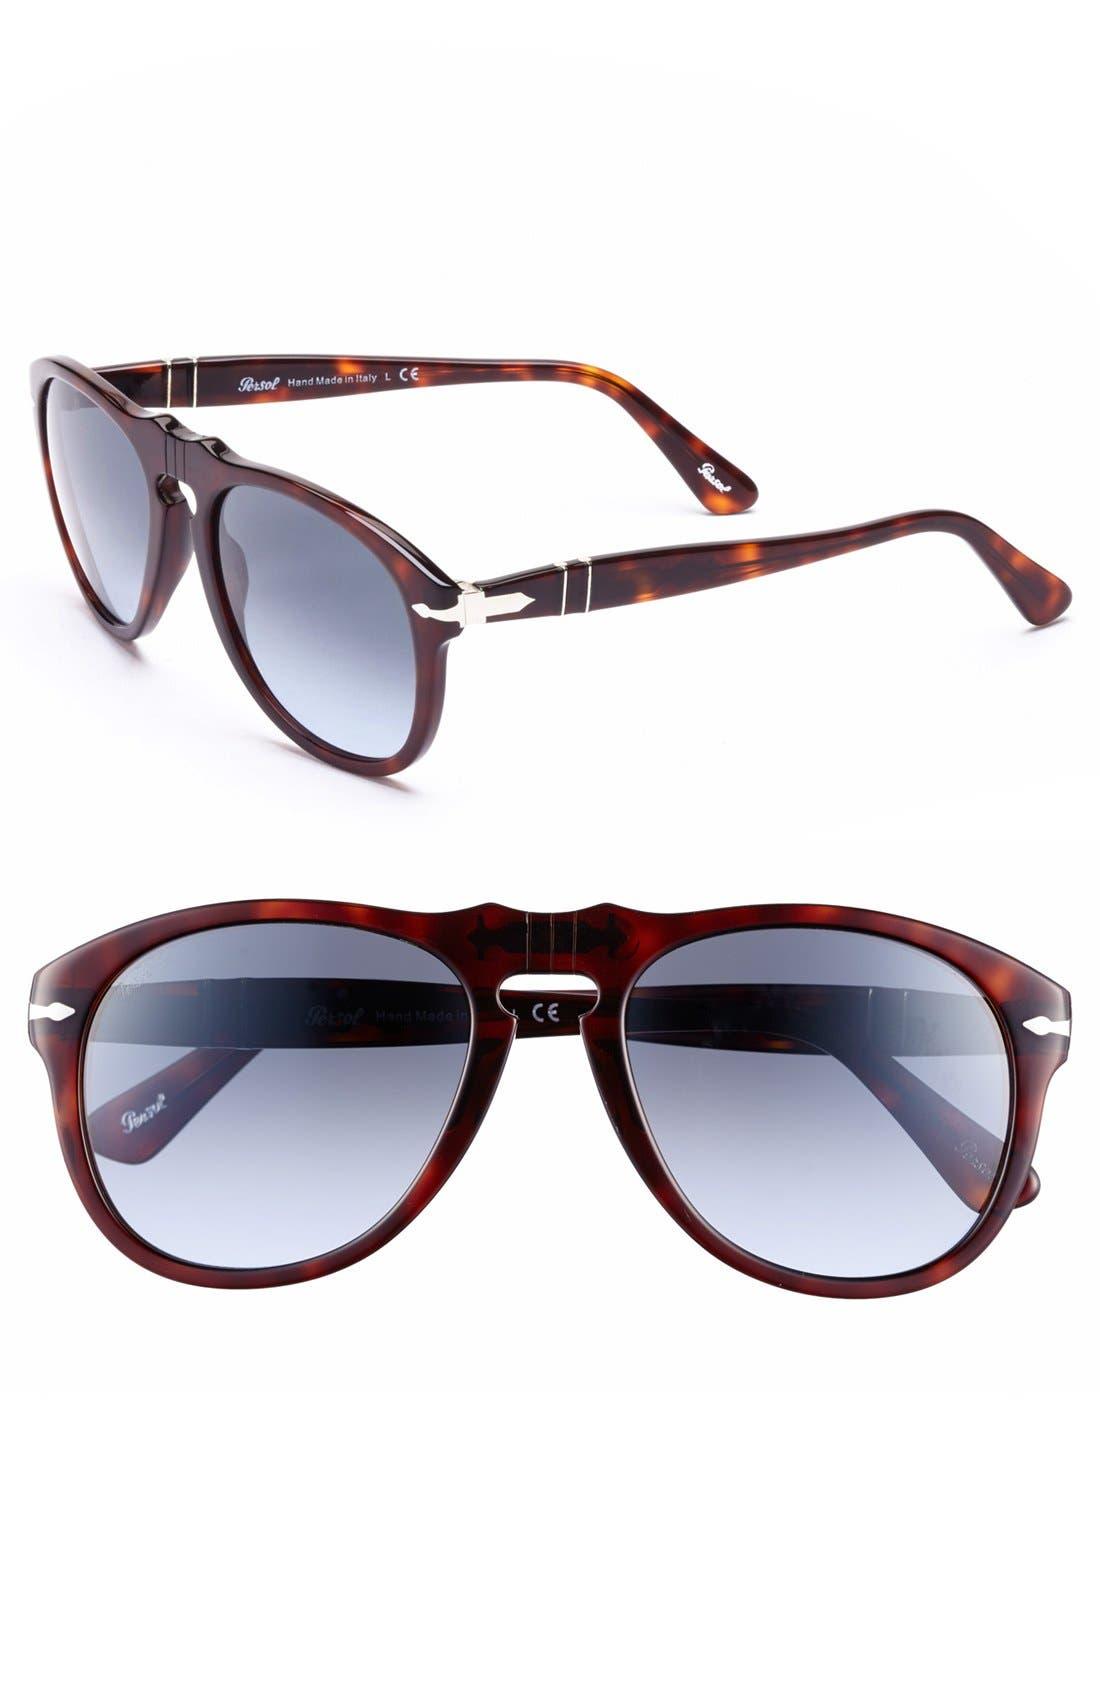 Main Image - Persol '649' Retro 52mm Keyhole Sunglasses